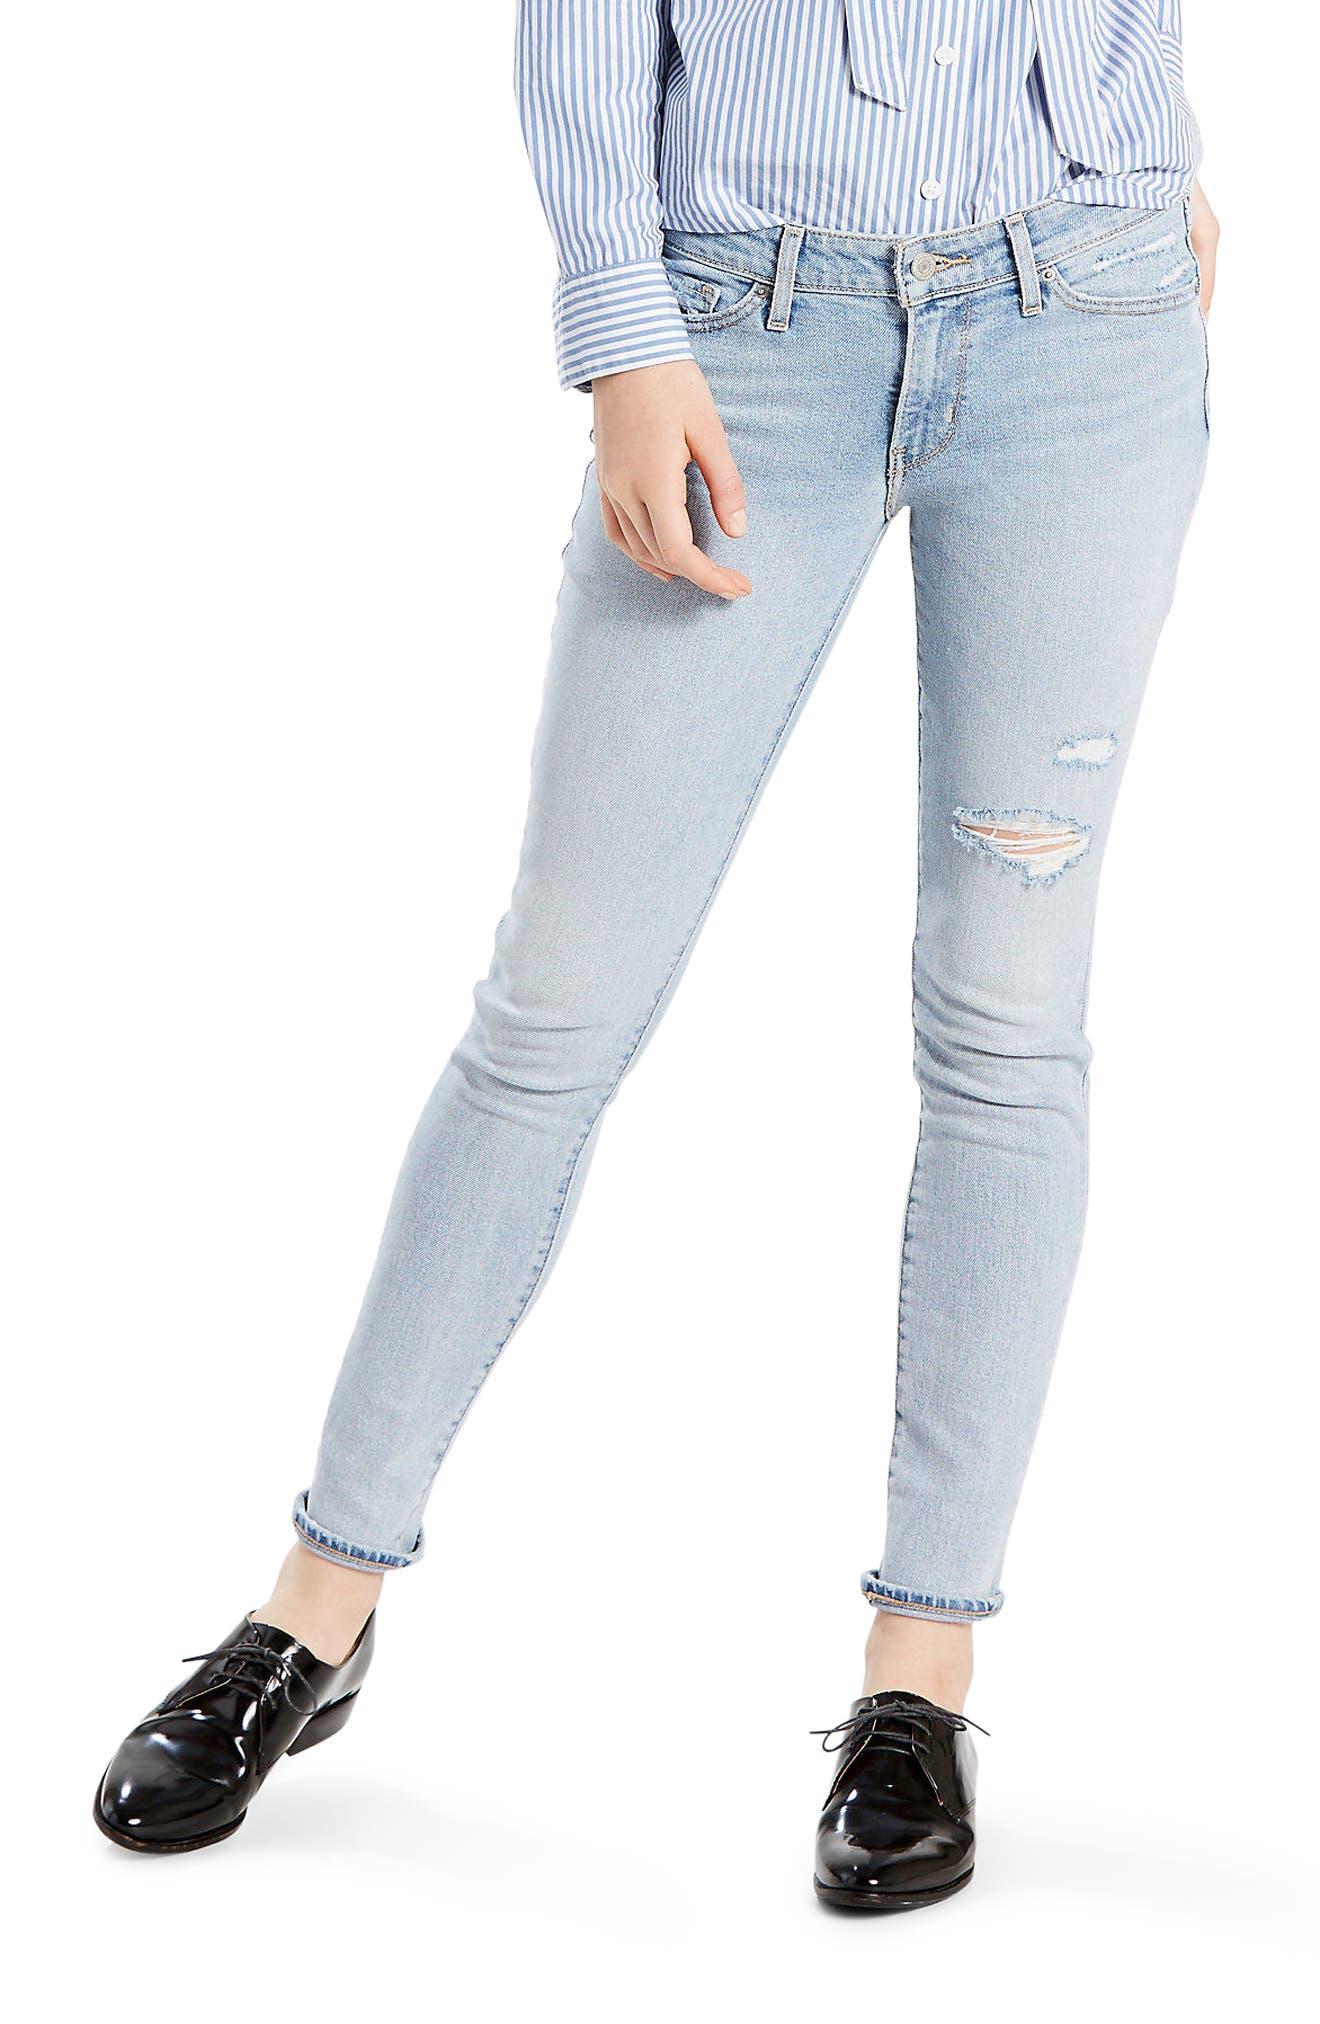 711 Skinny Jeans,                             Main thumbnail 1, color,                             420